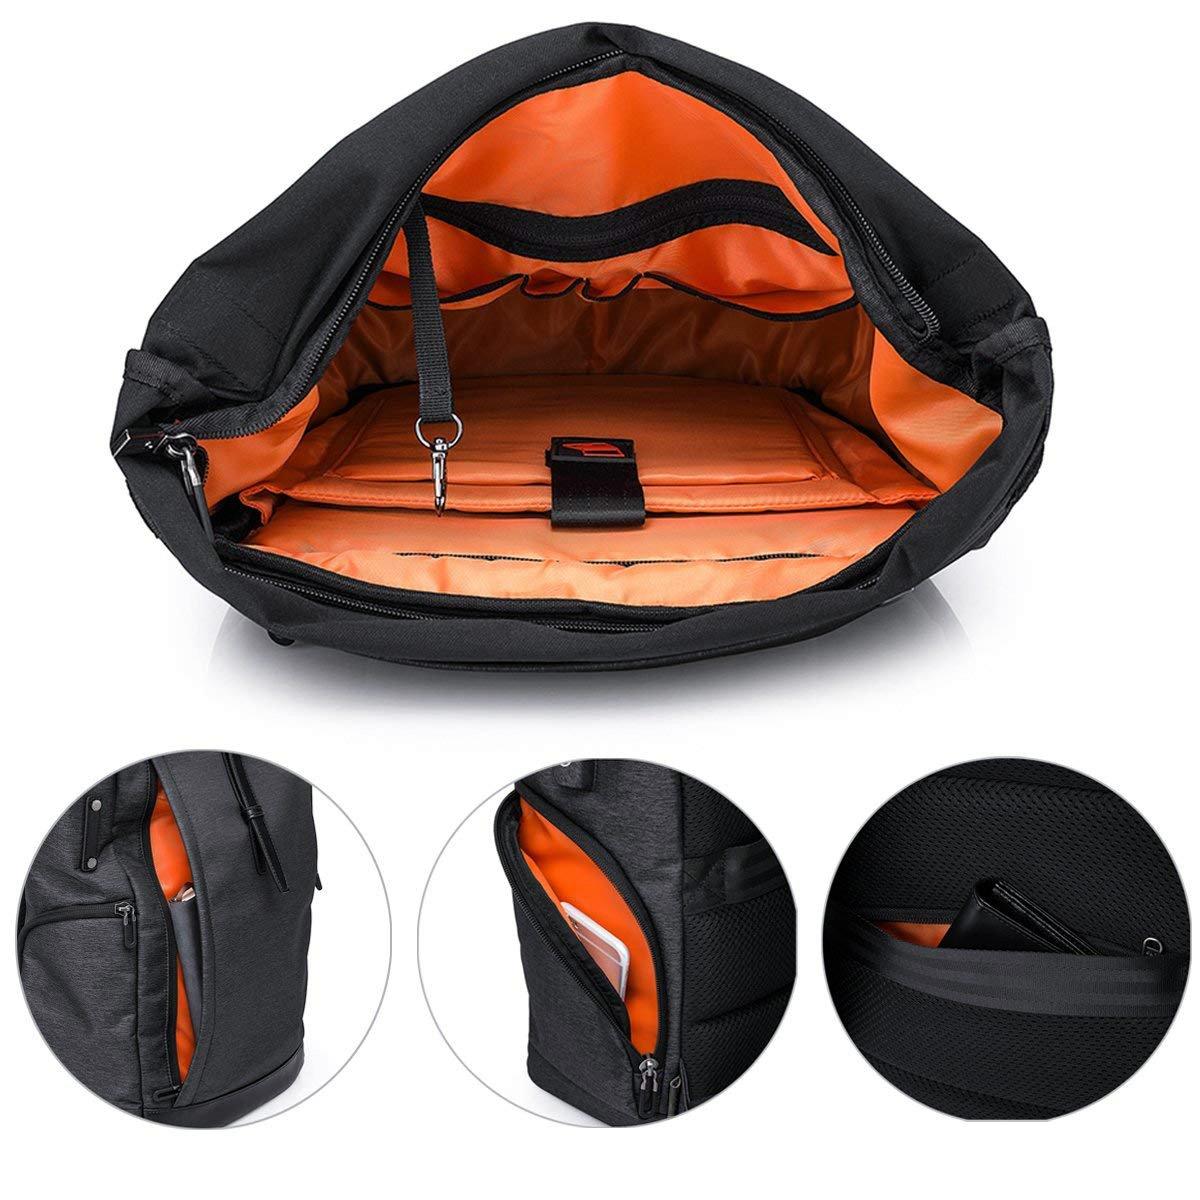 5a6e4c5eec55 Laptop Backpack 15.6 Inch Men Women Computer Rucksack